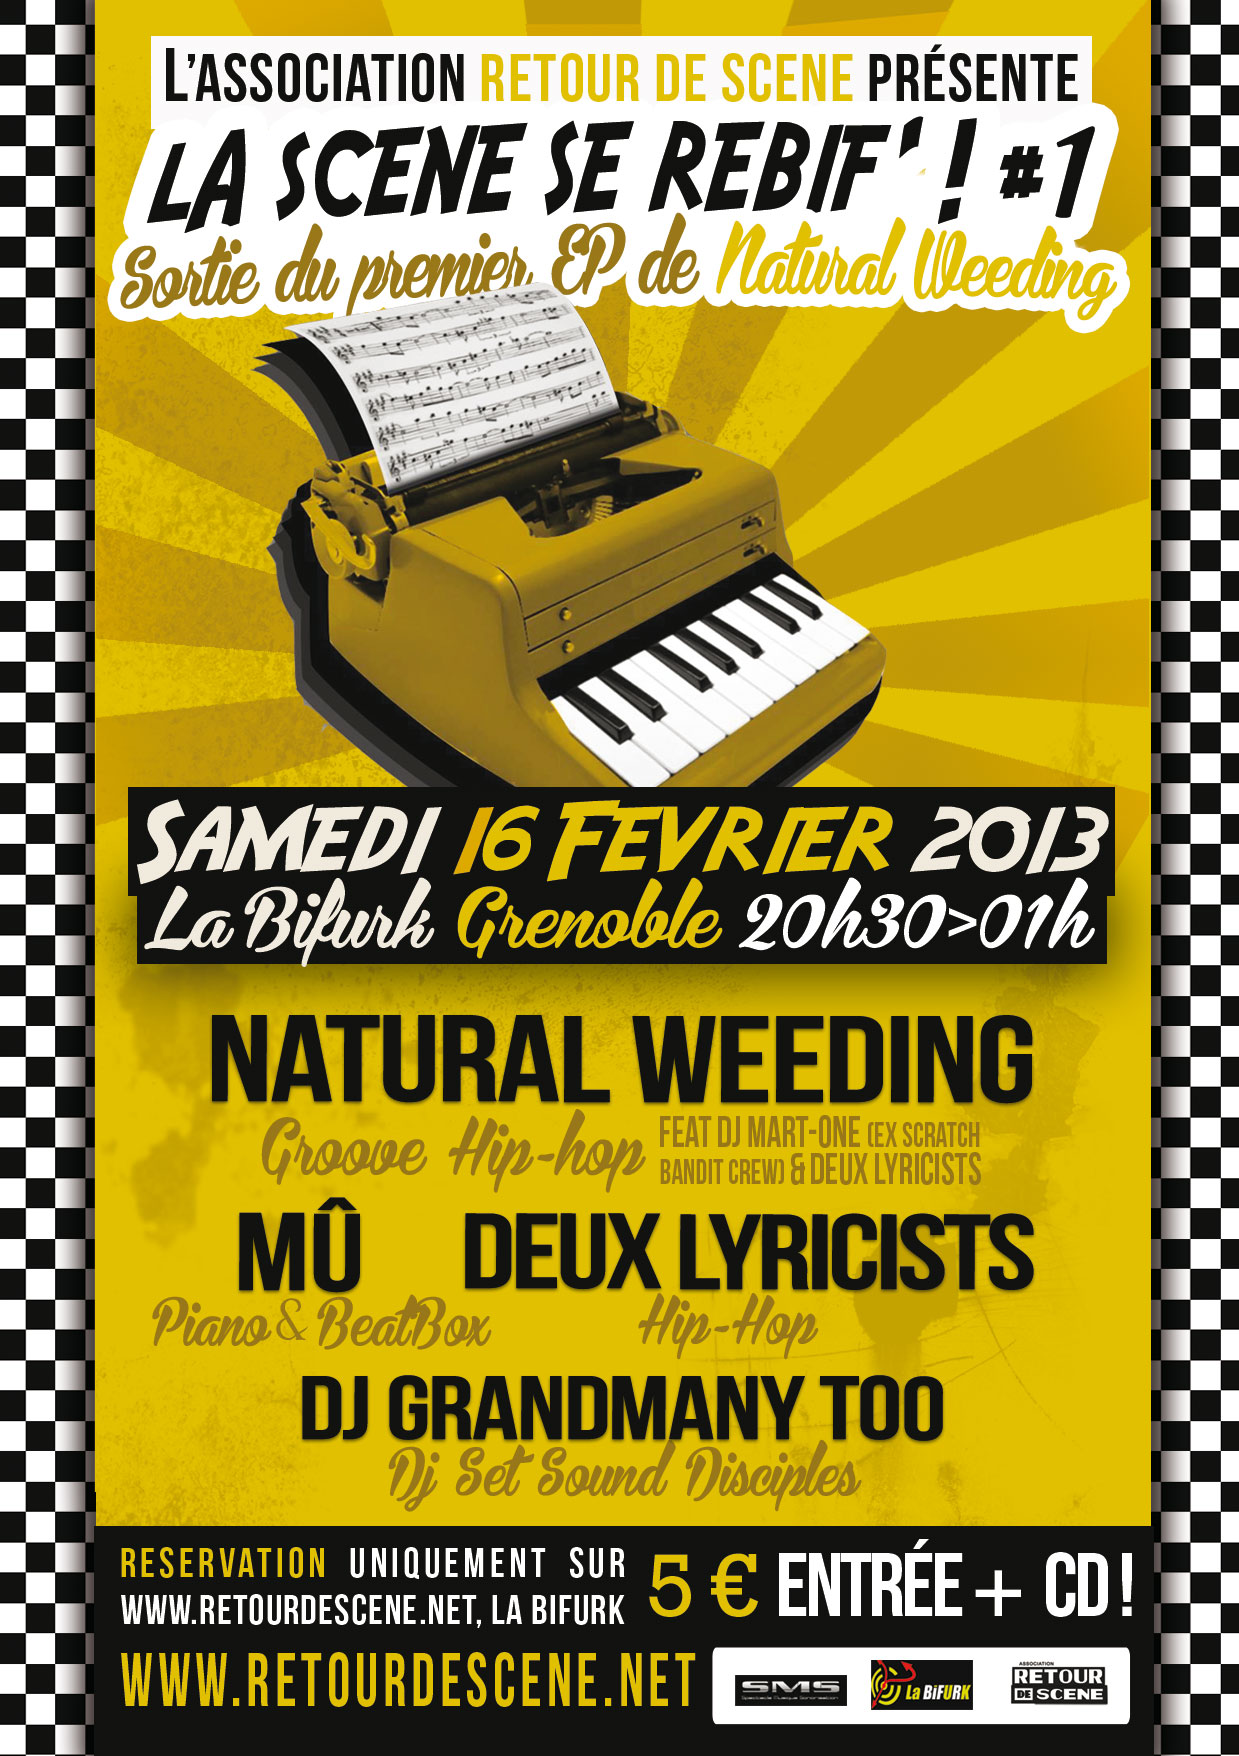 La Scène se Rebif - La Bifurk - 16/02/2013